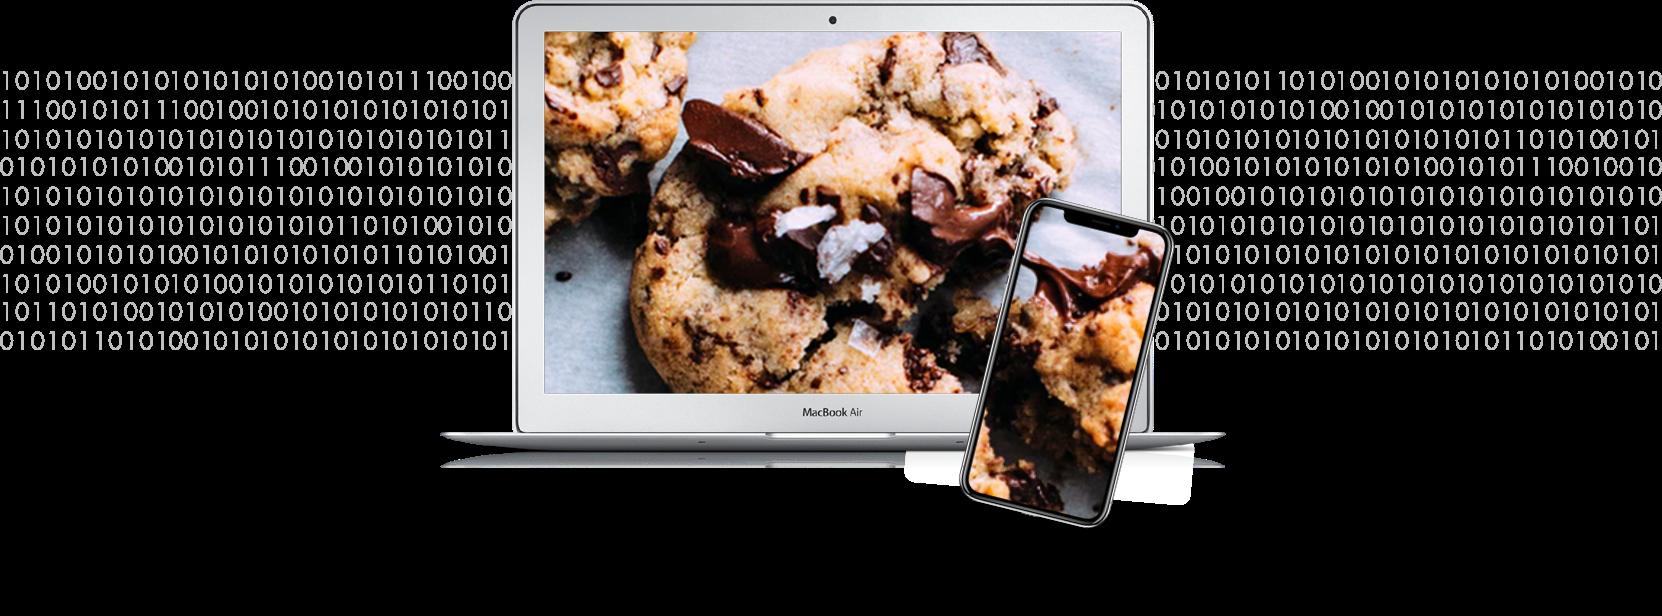 Cookieless - image